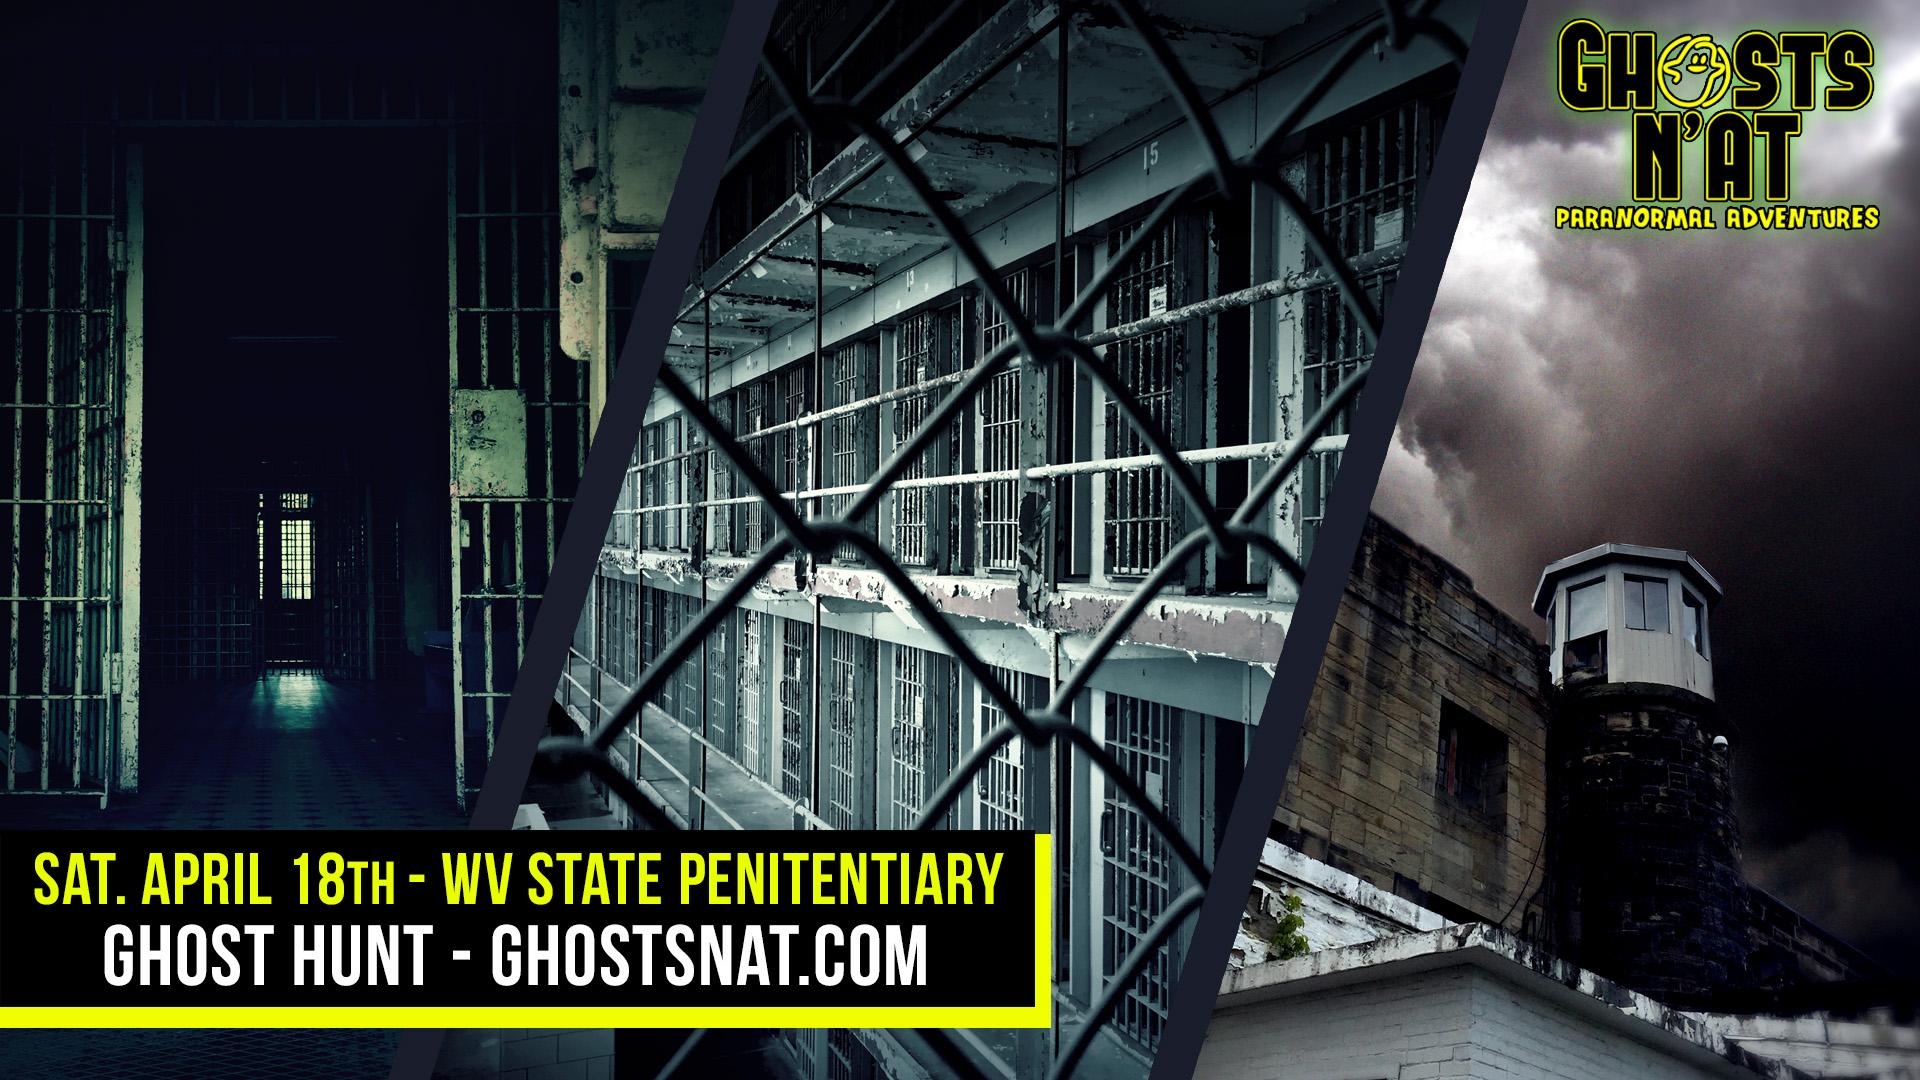 Moundsville Ghost Hunt